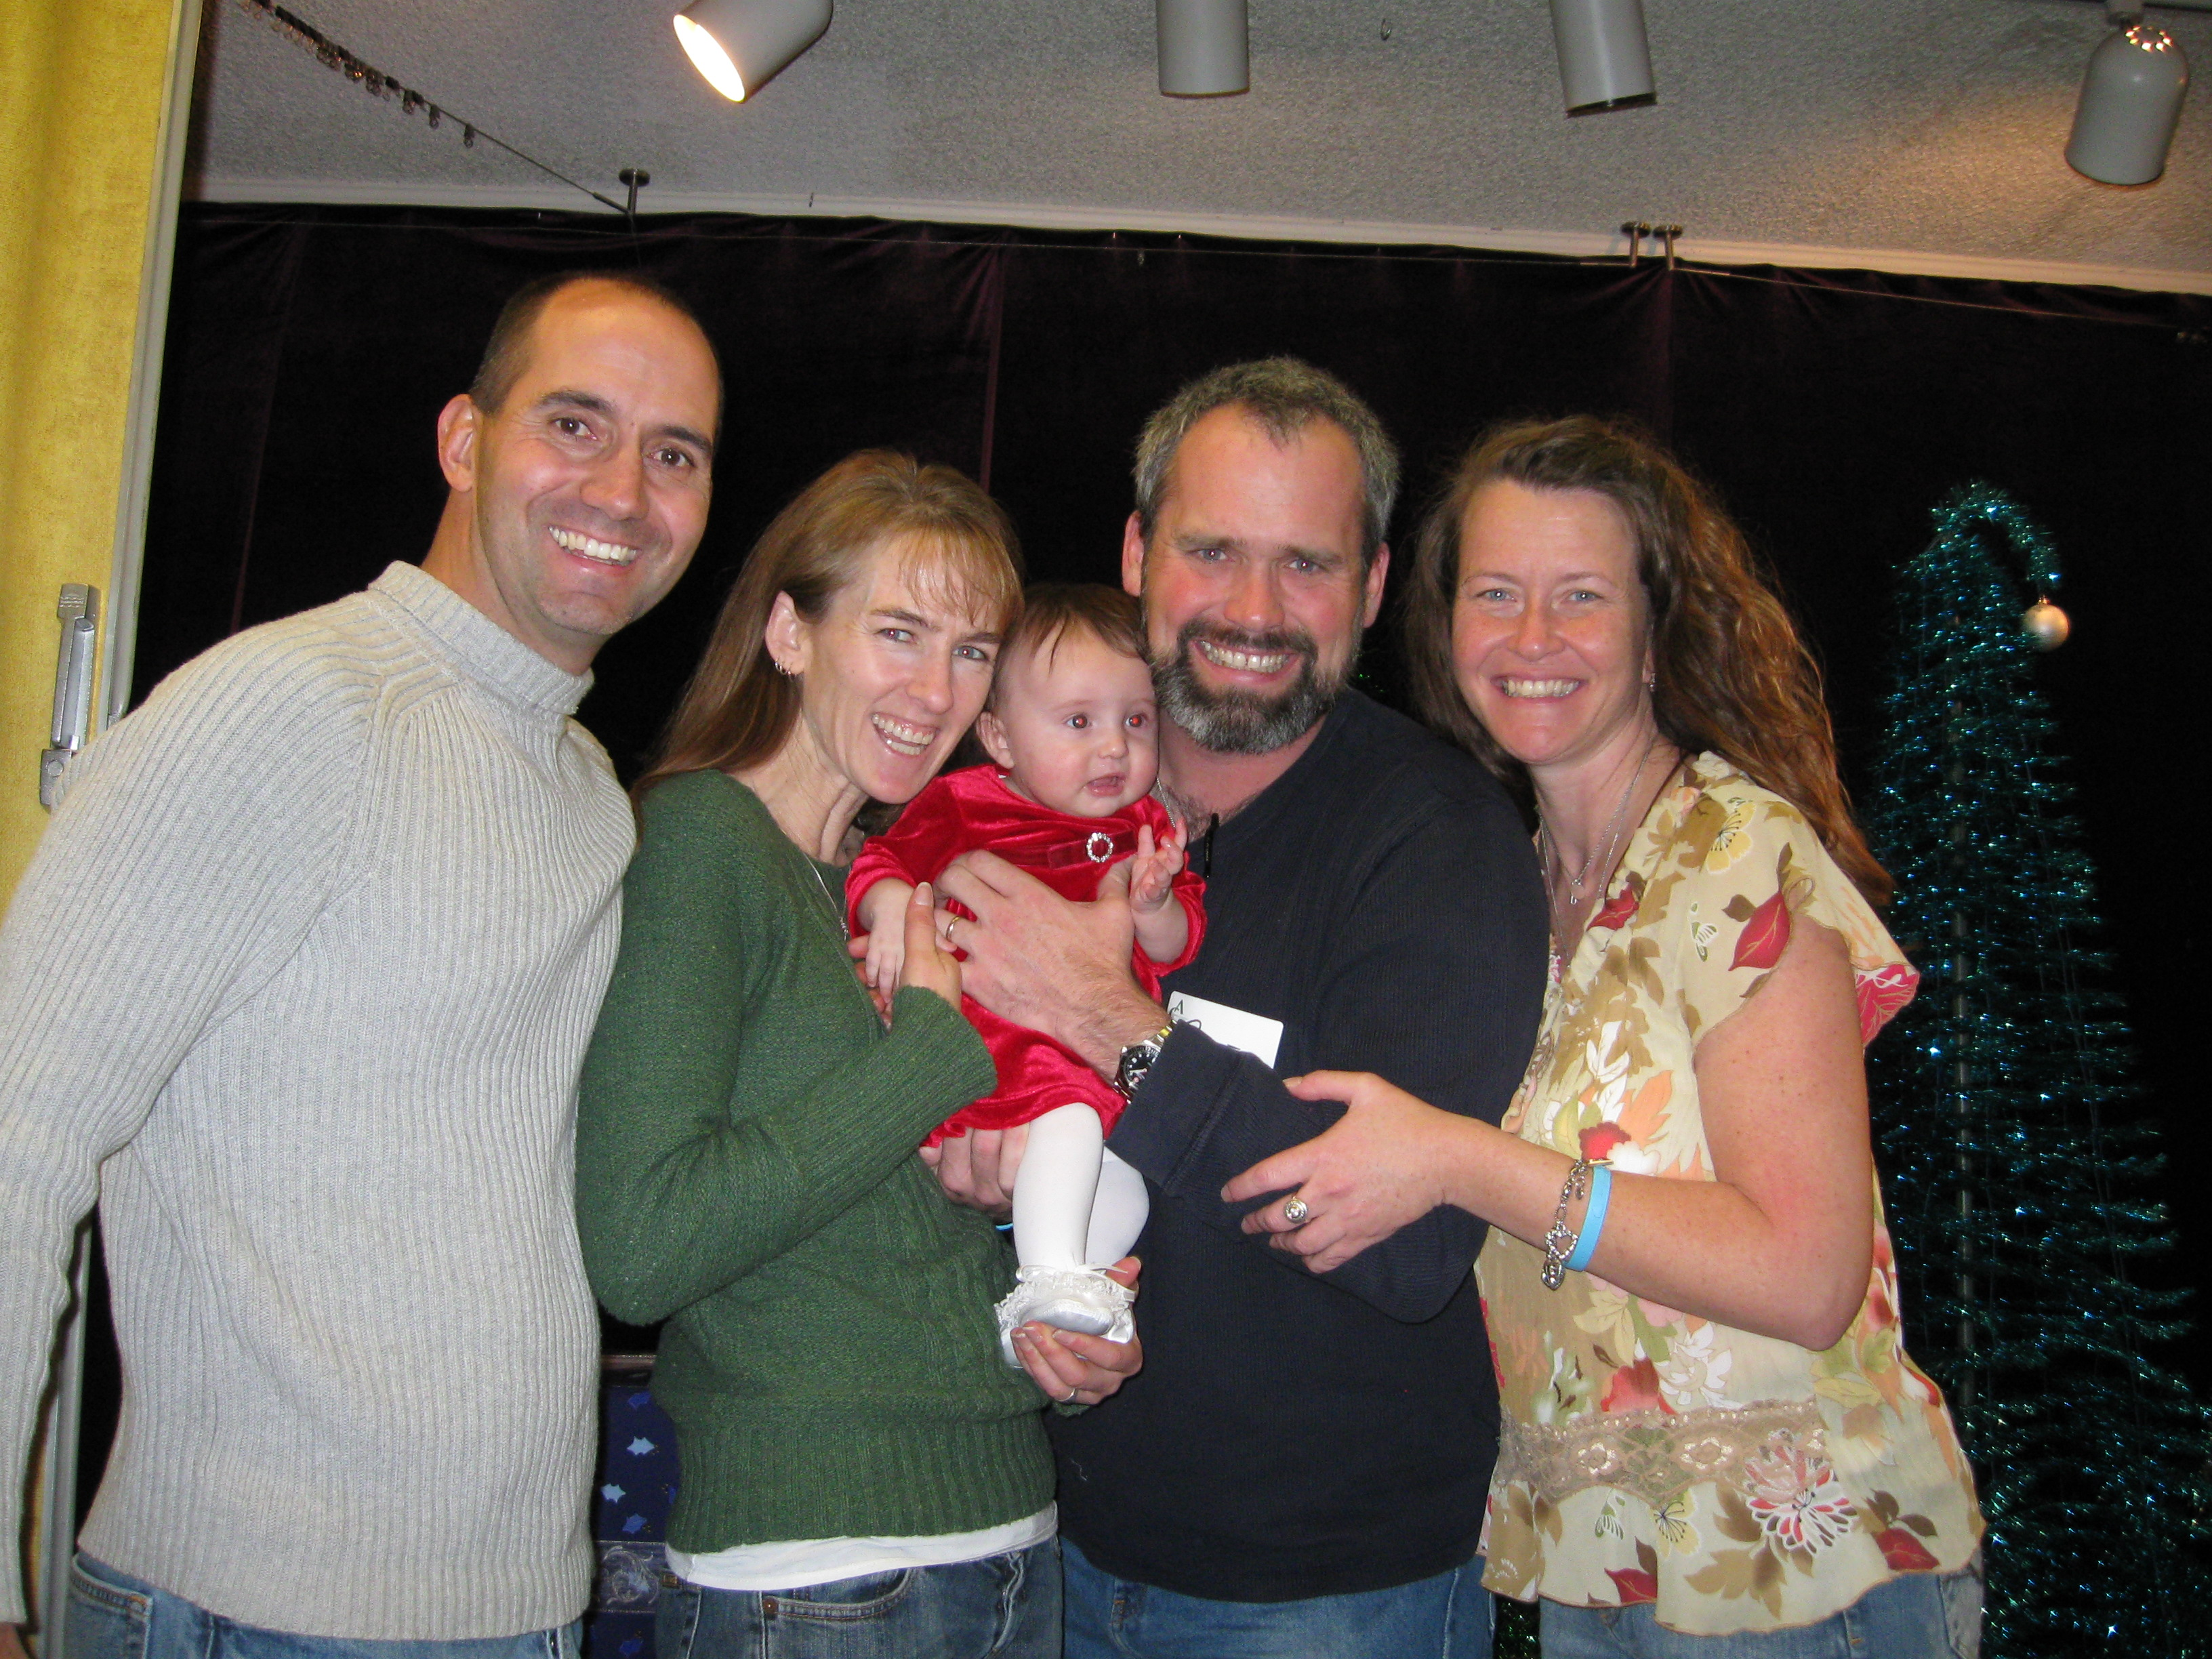 With Jayden, Joe and Jen at her dedication